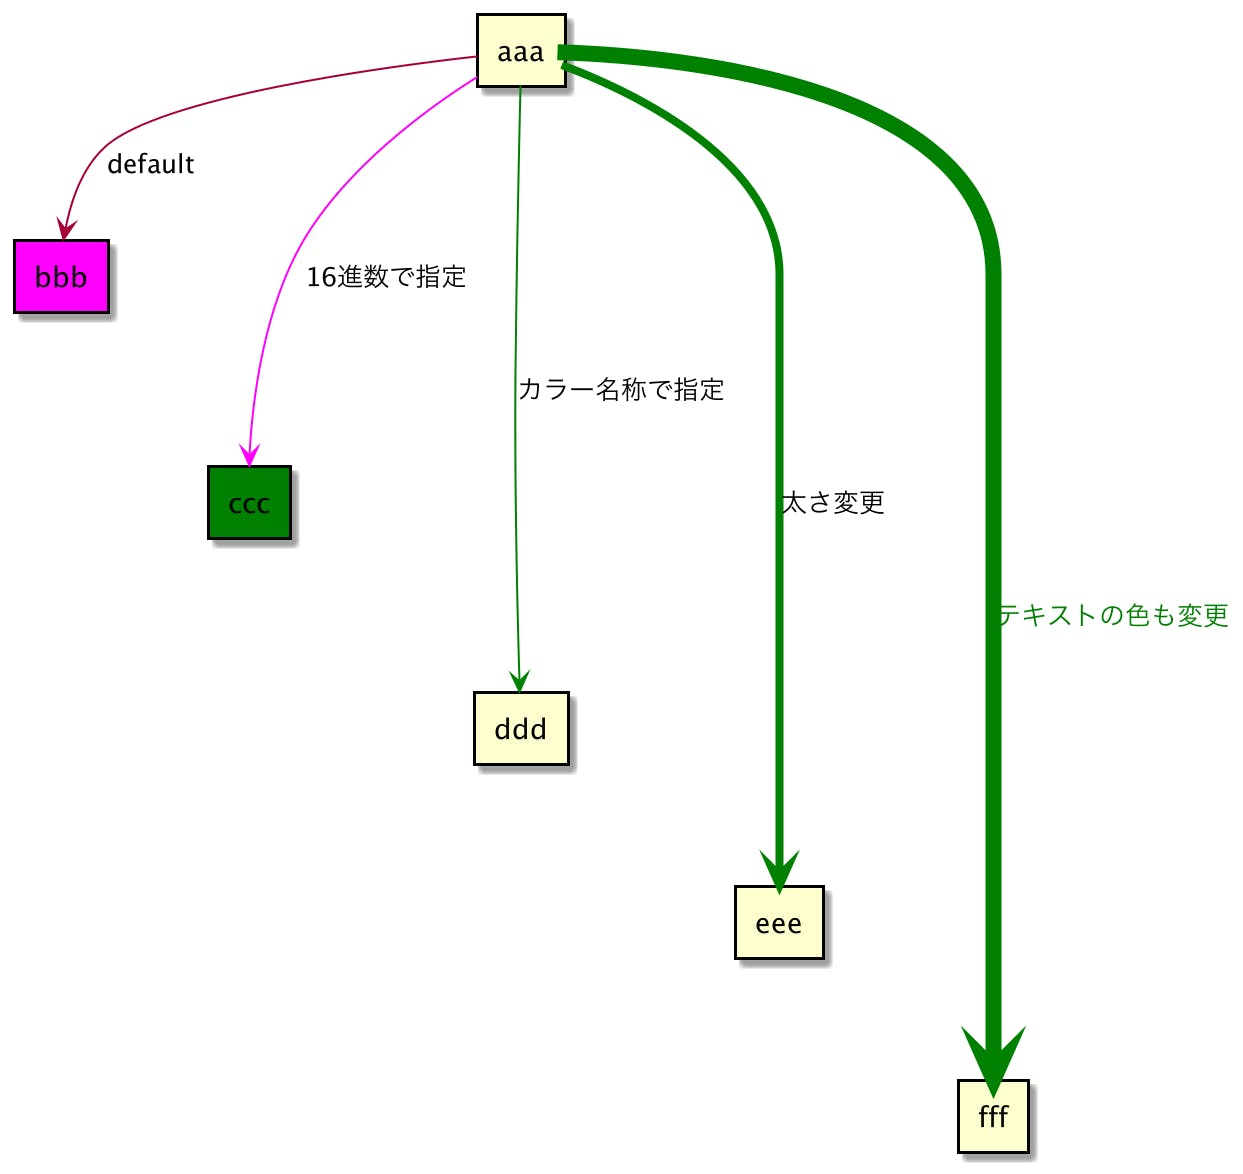 810-design-uml-style-position-note-link_01.png